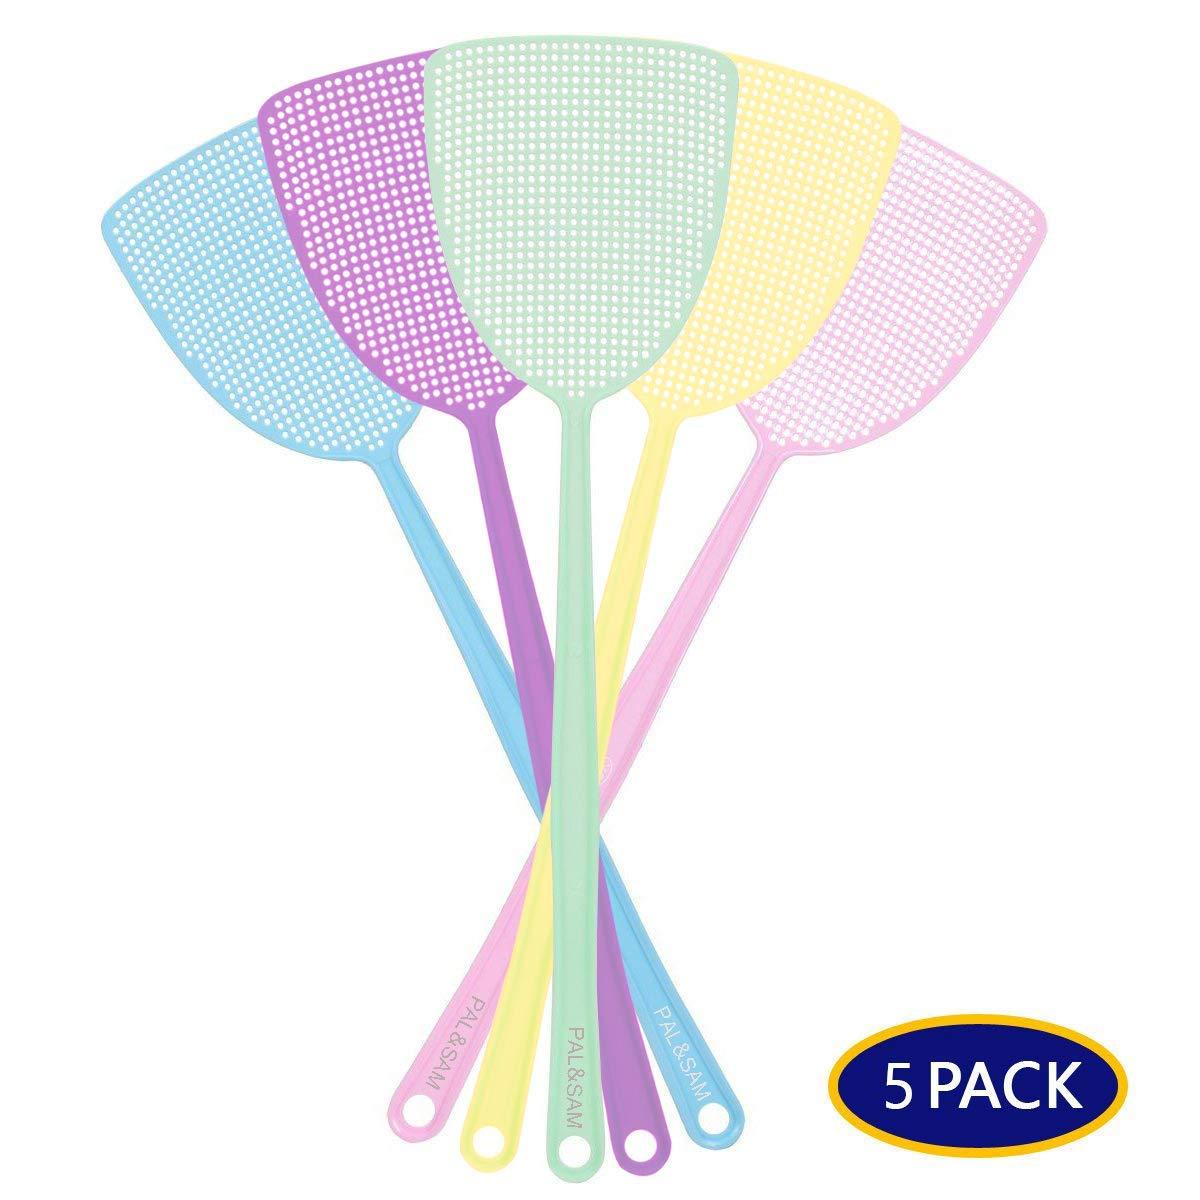 PAL SAM Swatter Flexible Assorted